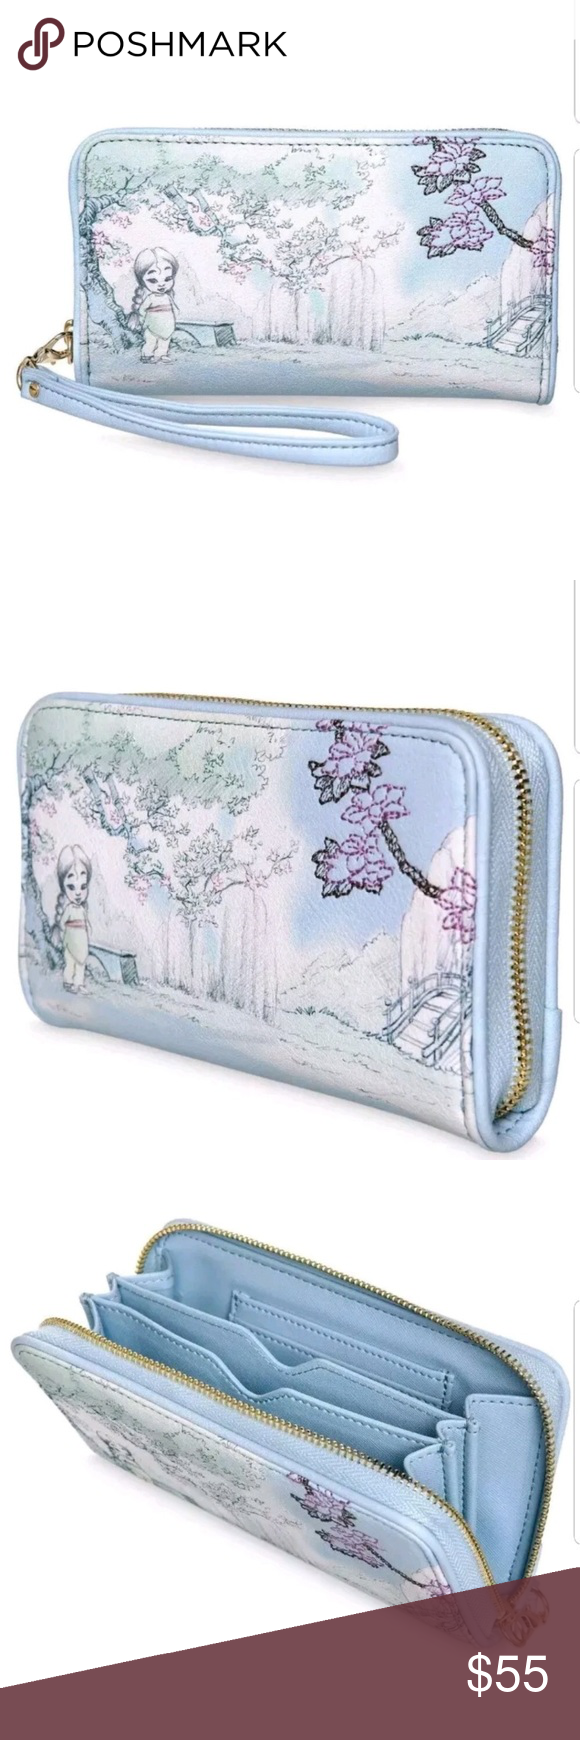 New With Tags Disney Cinderella Animator Wristlet Wallet